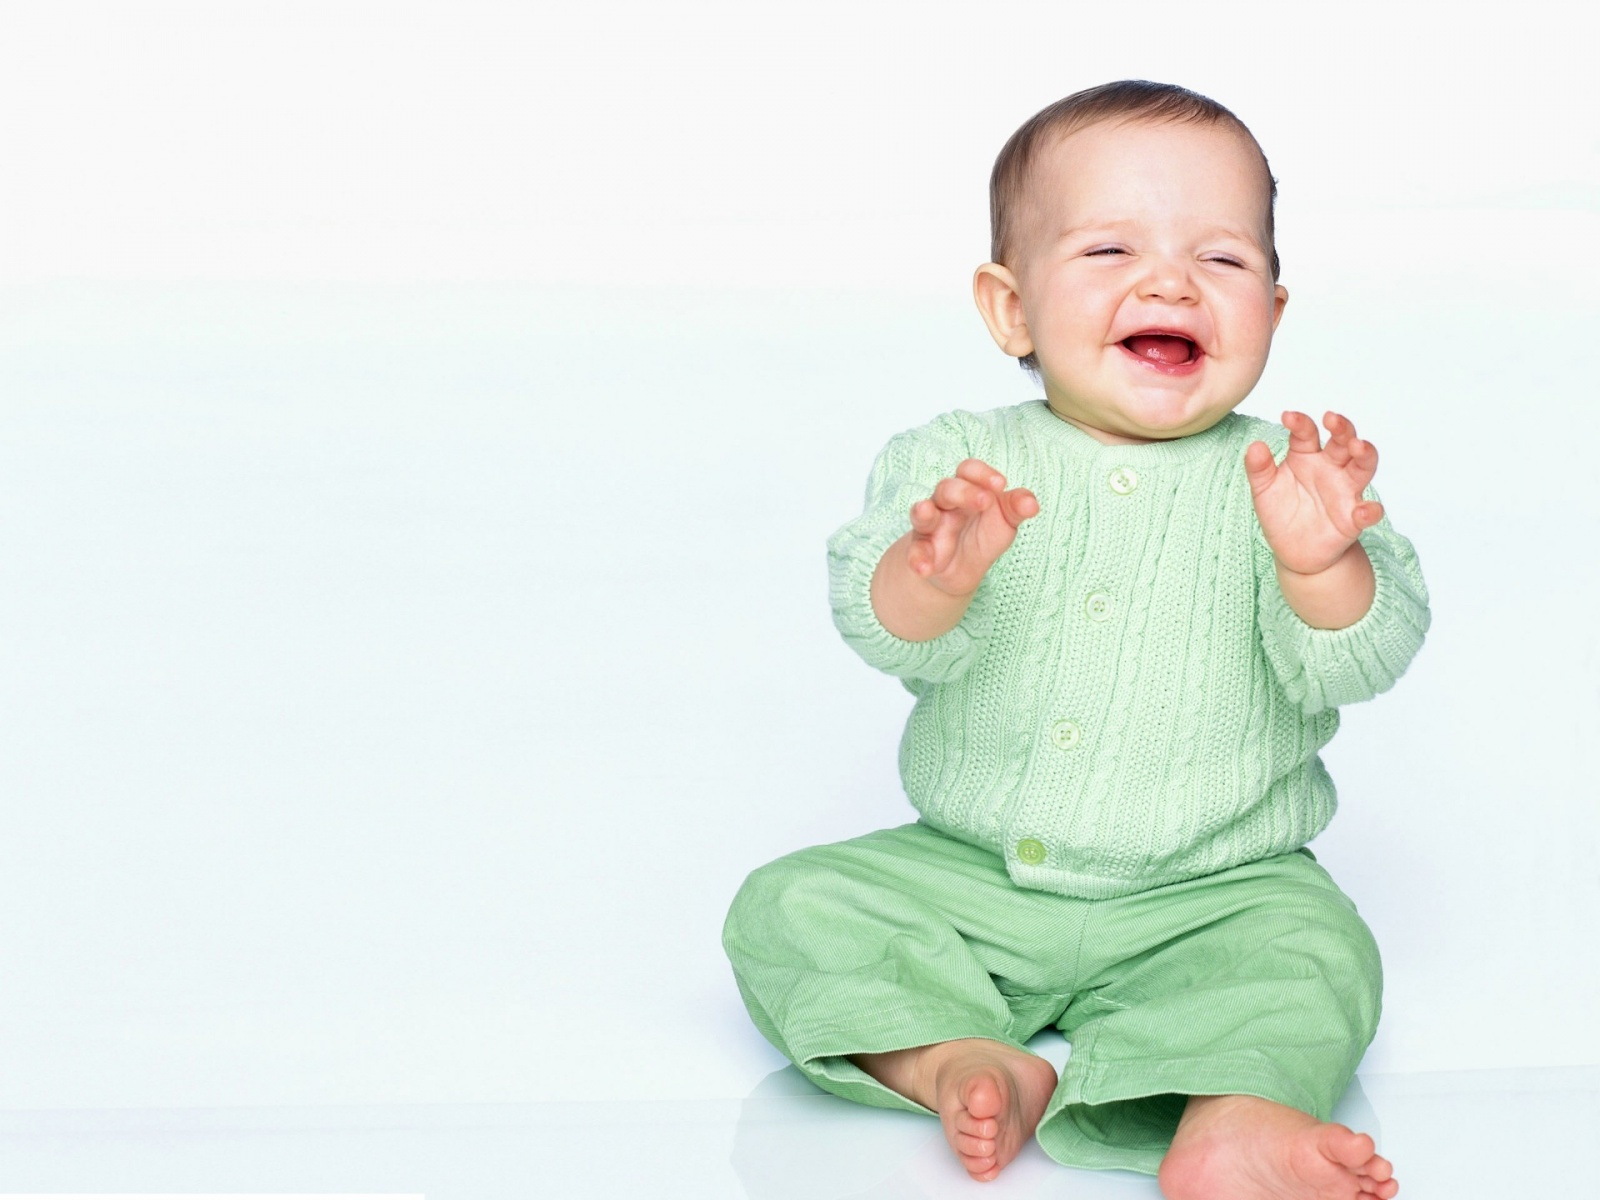 LOVE QUOTES cute babycute baby wallpapercute girls picscute